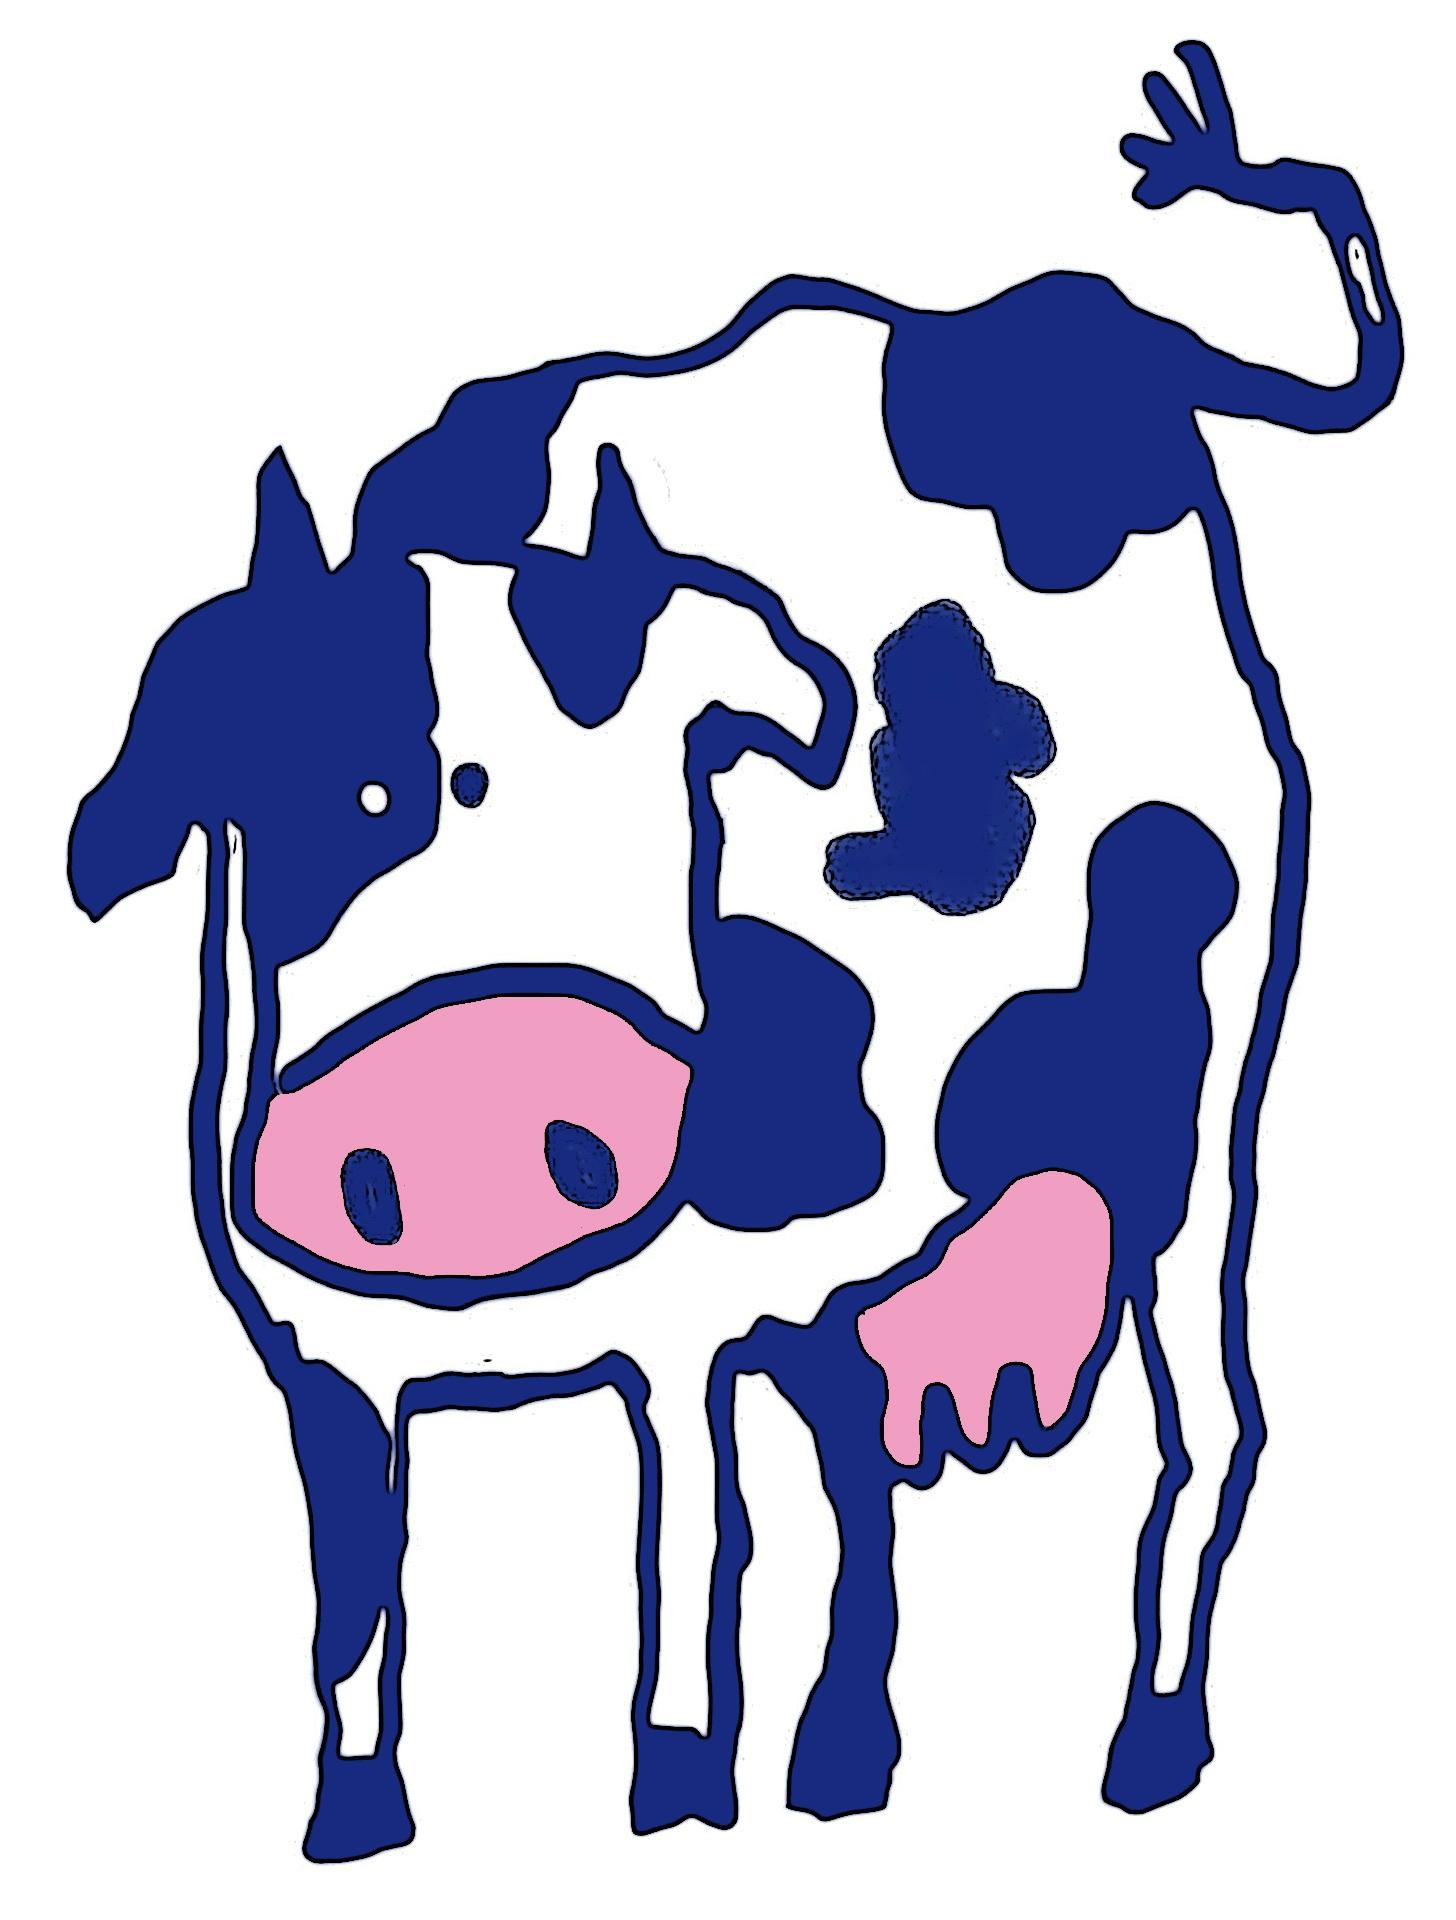 Fotos Gratis Ganado Pastar Azul Carne De Vaca Obra De Arte